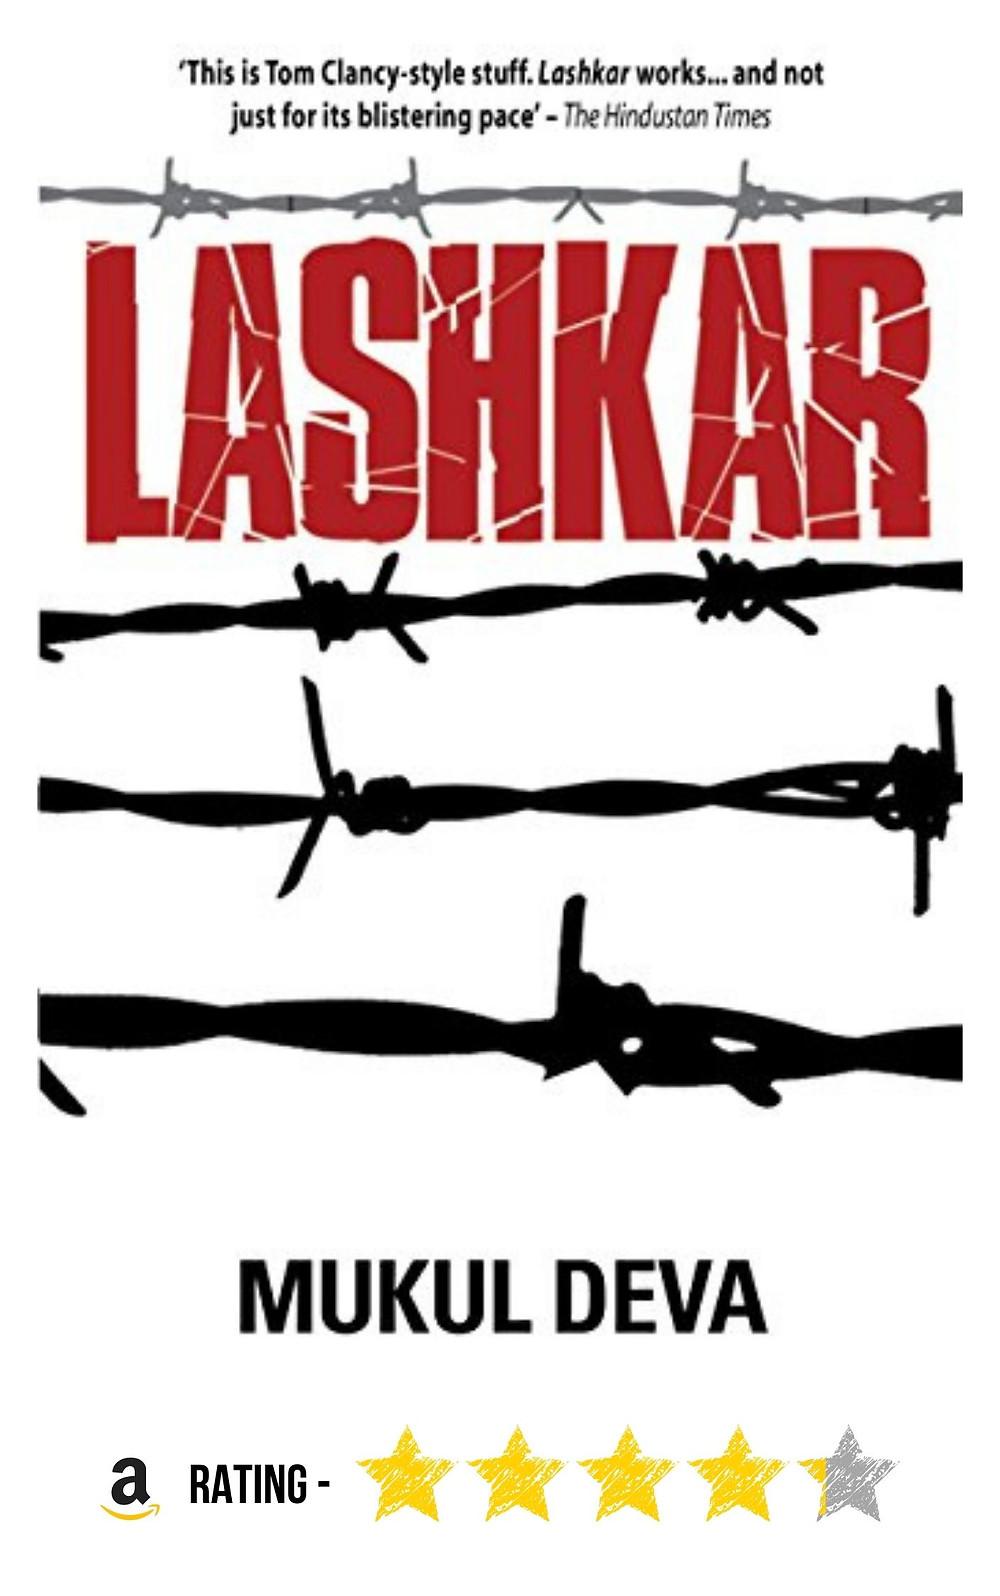 "Amazon purchase link to Mukul Deva's mystery thriller ""Lashkar'"